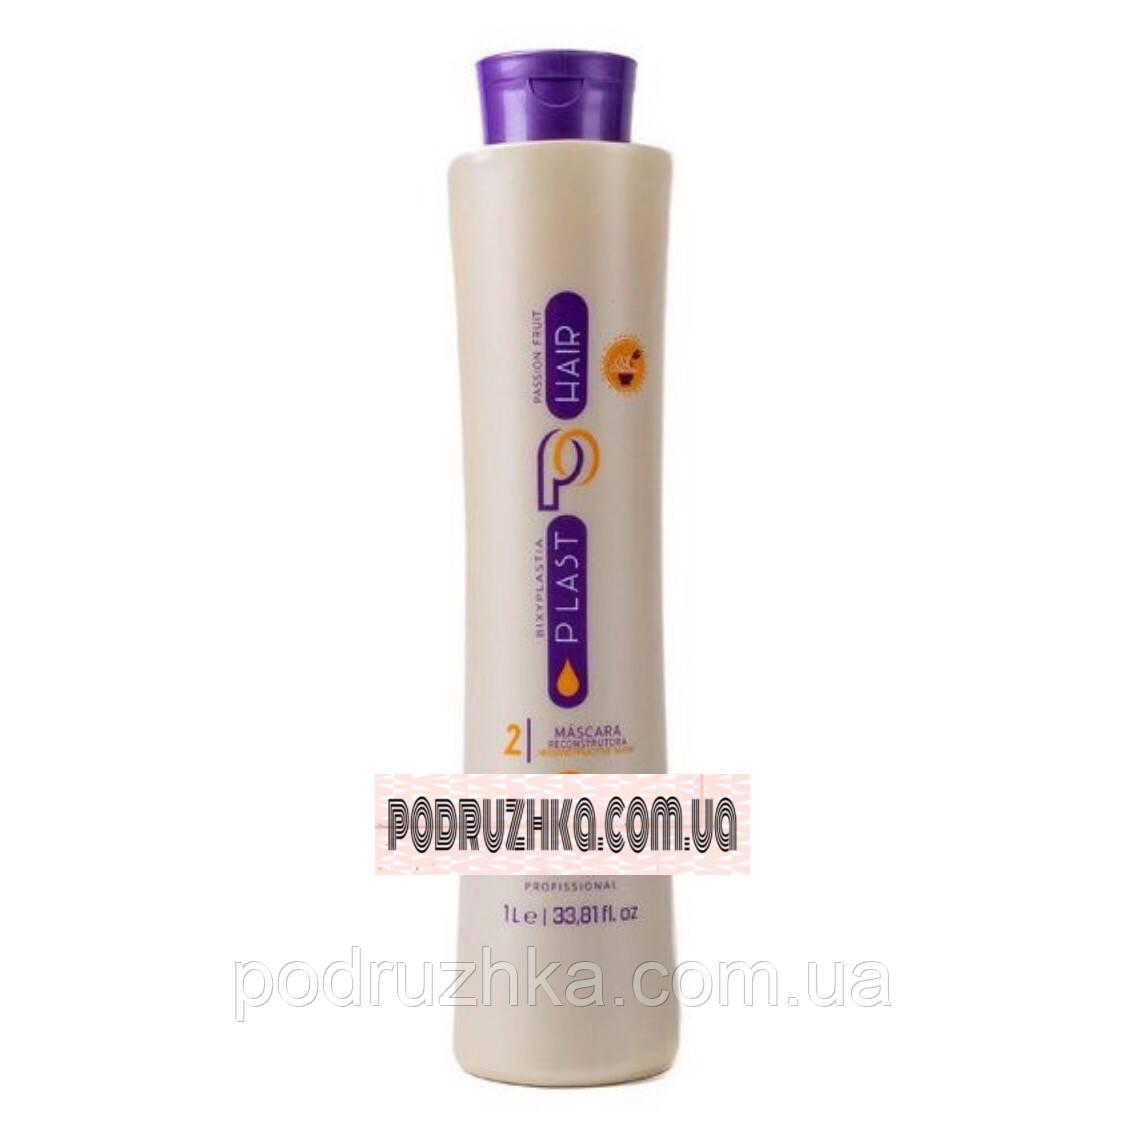 Бискипластия Plast Hair Bixyplastia Passion Fruit (шаг 2), 500 мл